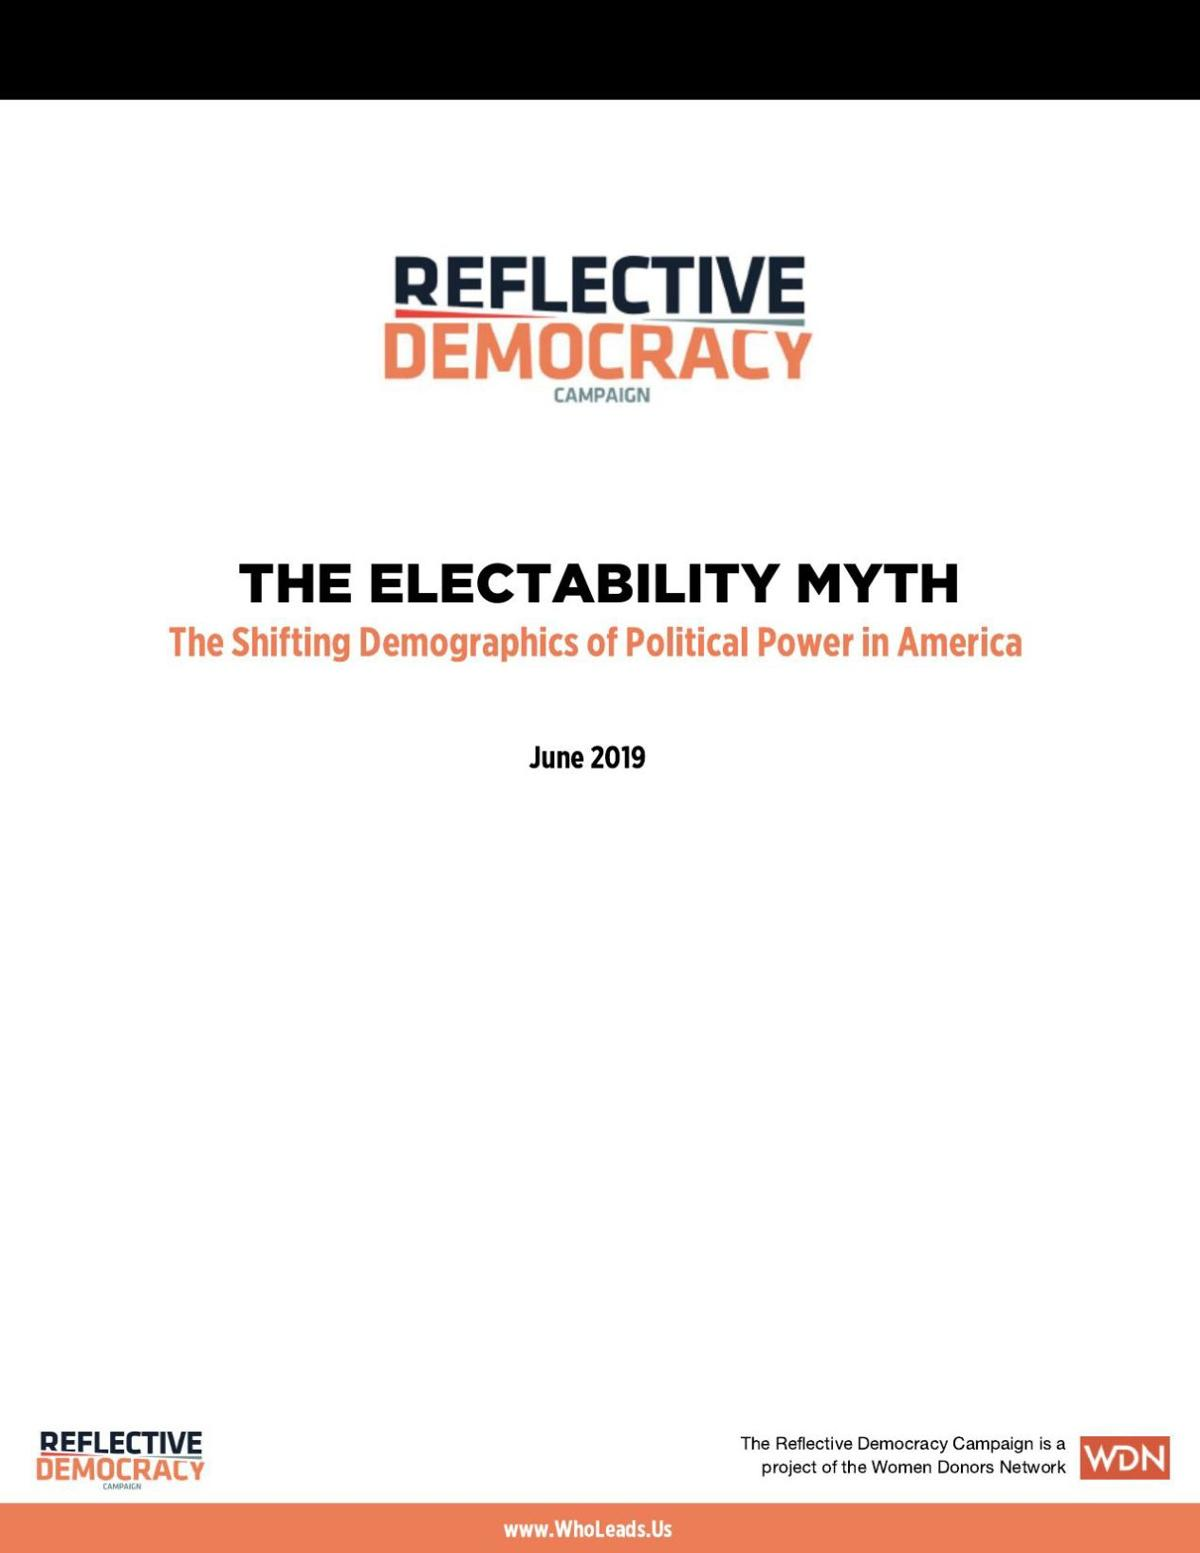 Reflective Democracy Campaign